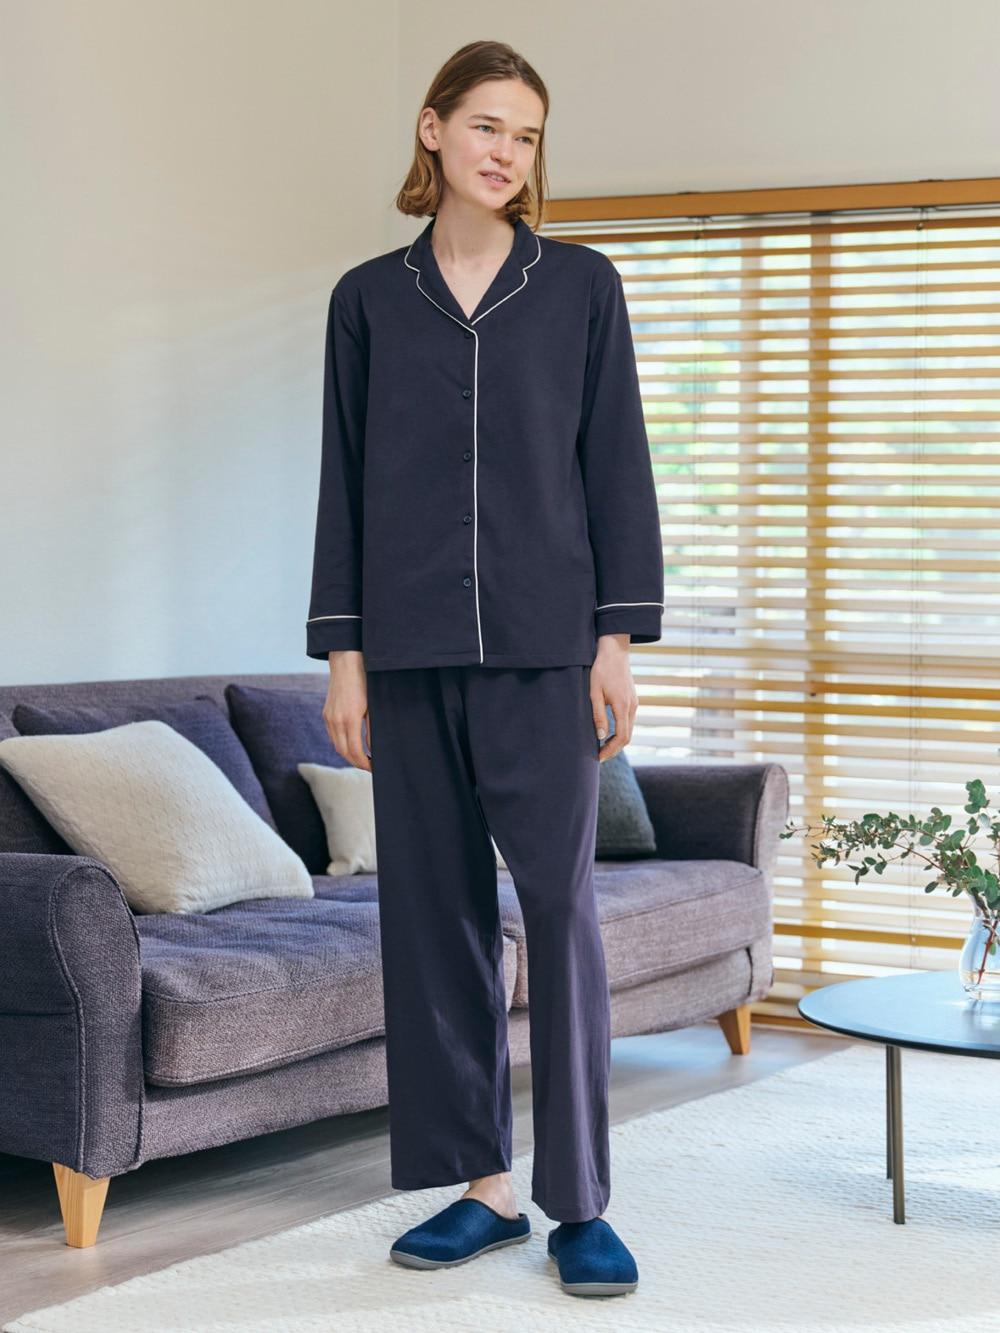 Lightweight, soft fabrics for a comfortable nights sleep.